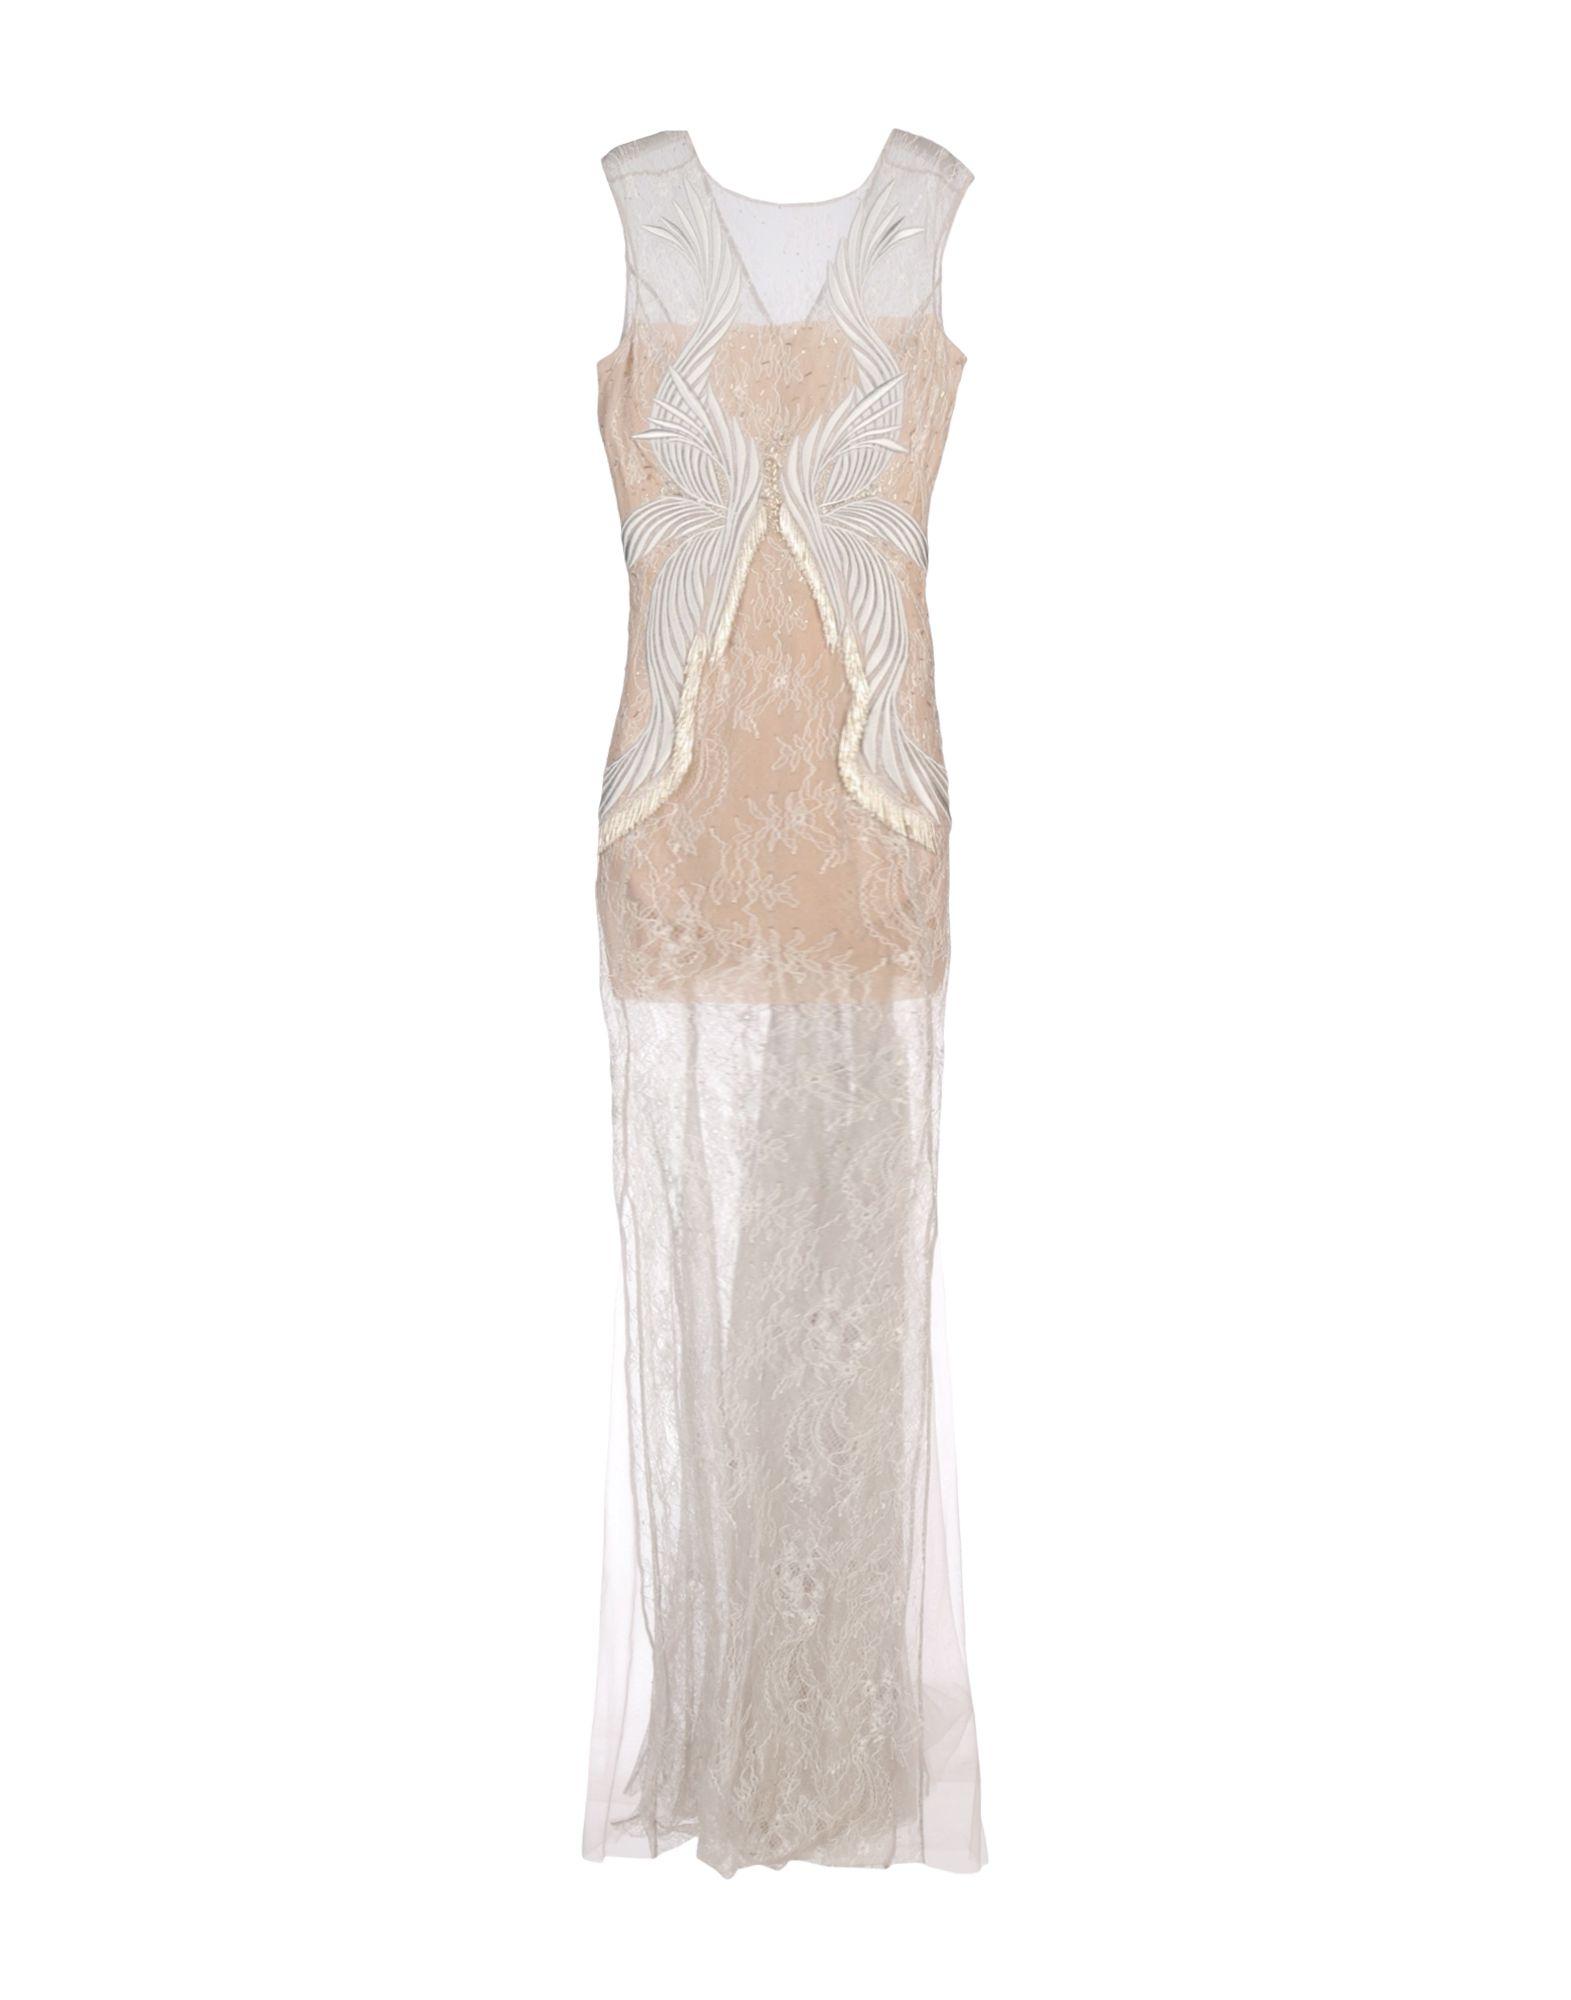 ZEYNEP ERDOǴAN Длинное платье l a girl блеск для губ triple enhancing lipgloss 8 5 гр 4 оттенка блеск для губ triple enhancing lipgloss 8 5 гр 4 оттенка 8 5 гр shiny